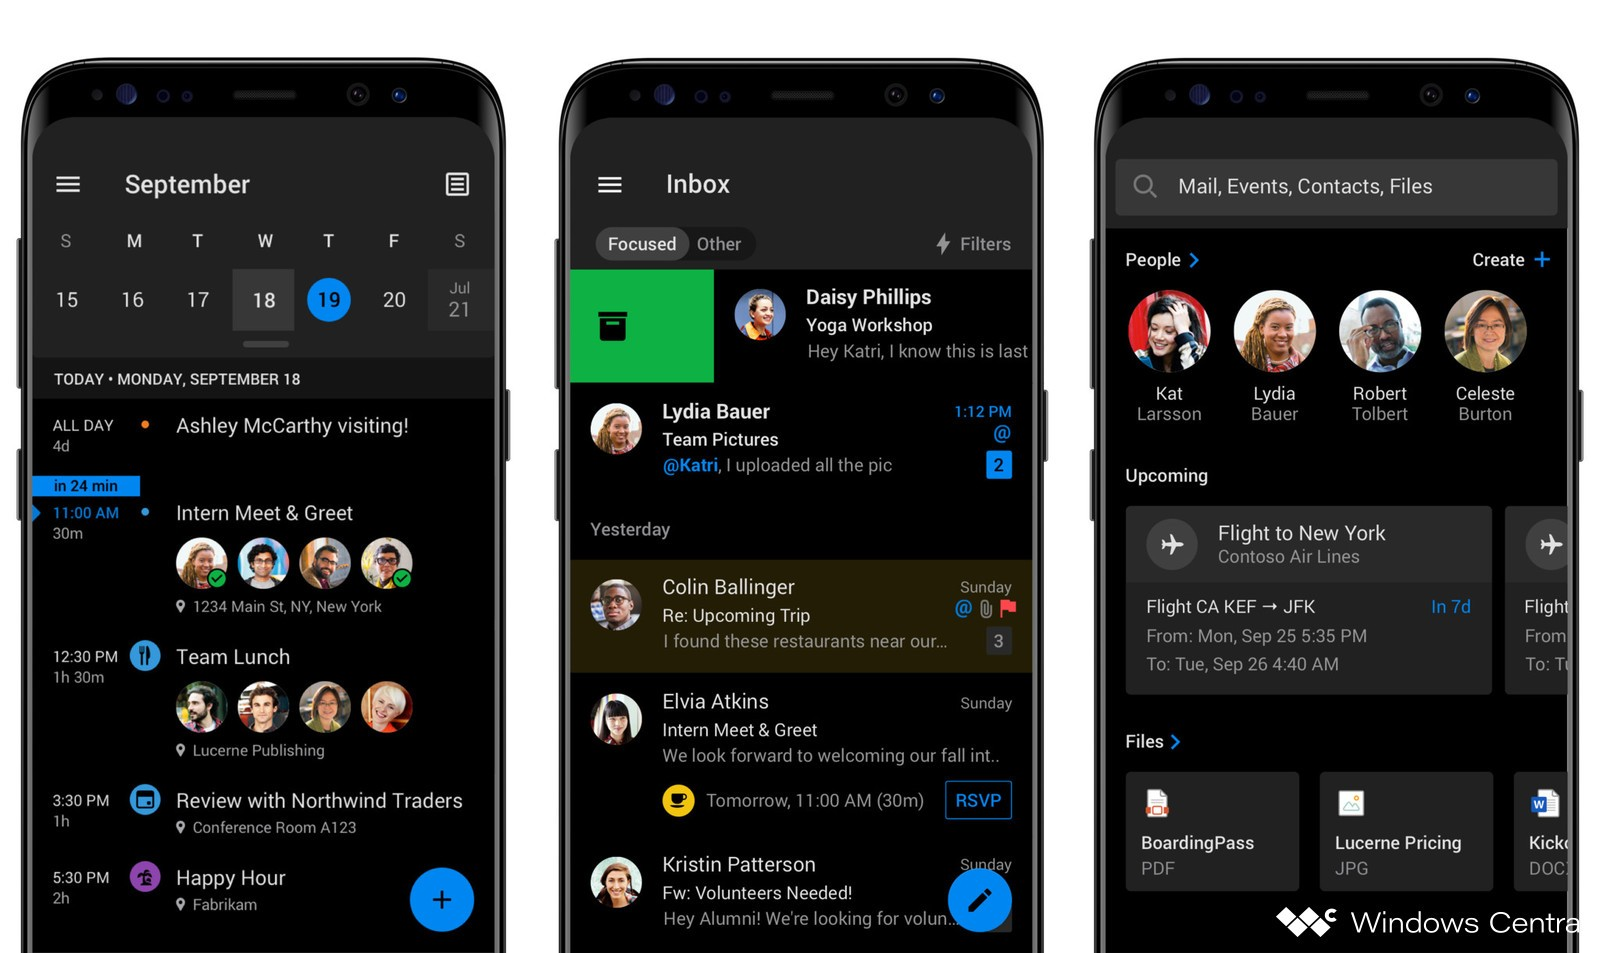 Microsoft Outlook per Android tema scuro mockup